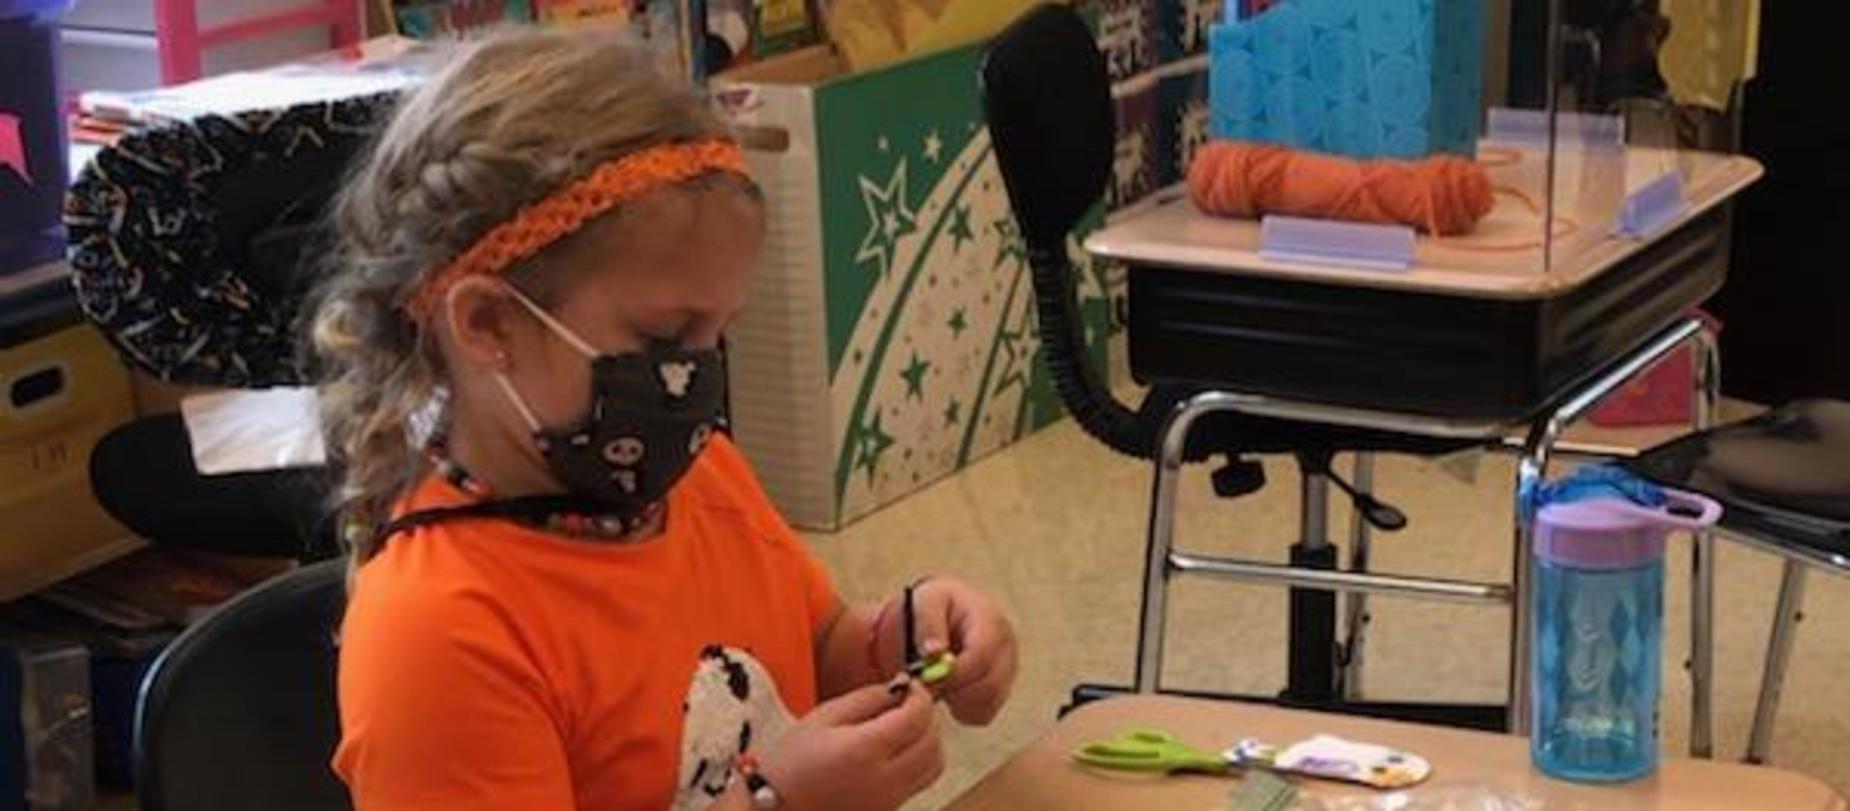 student making halloween crafts